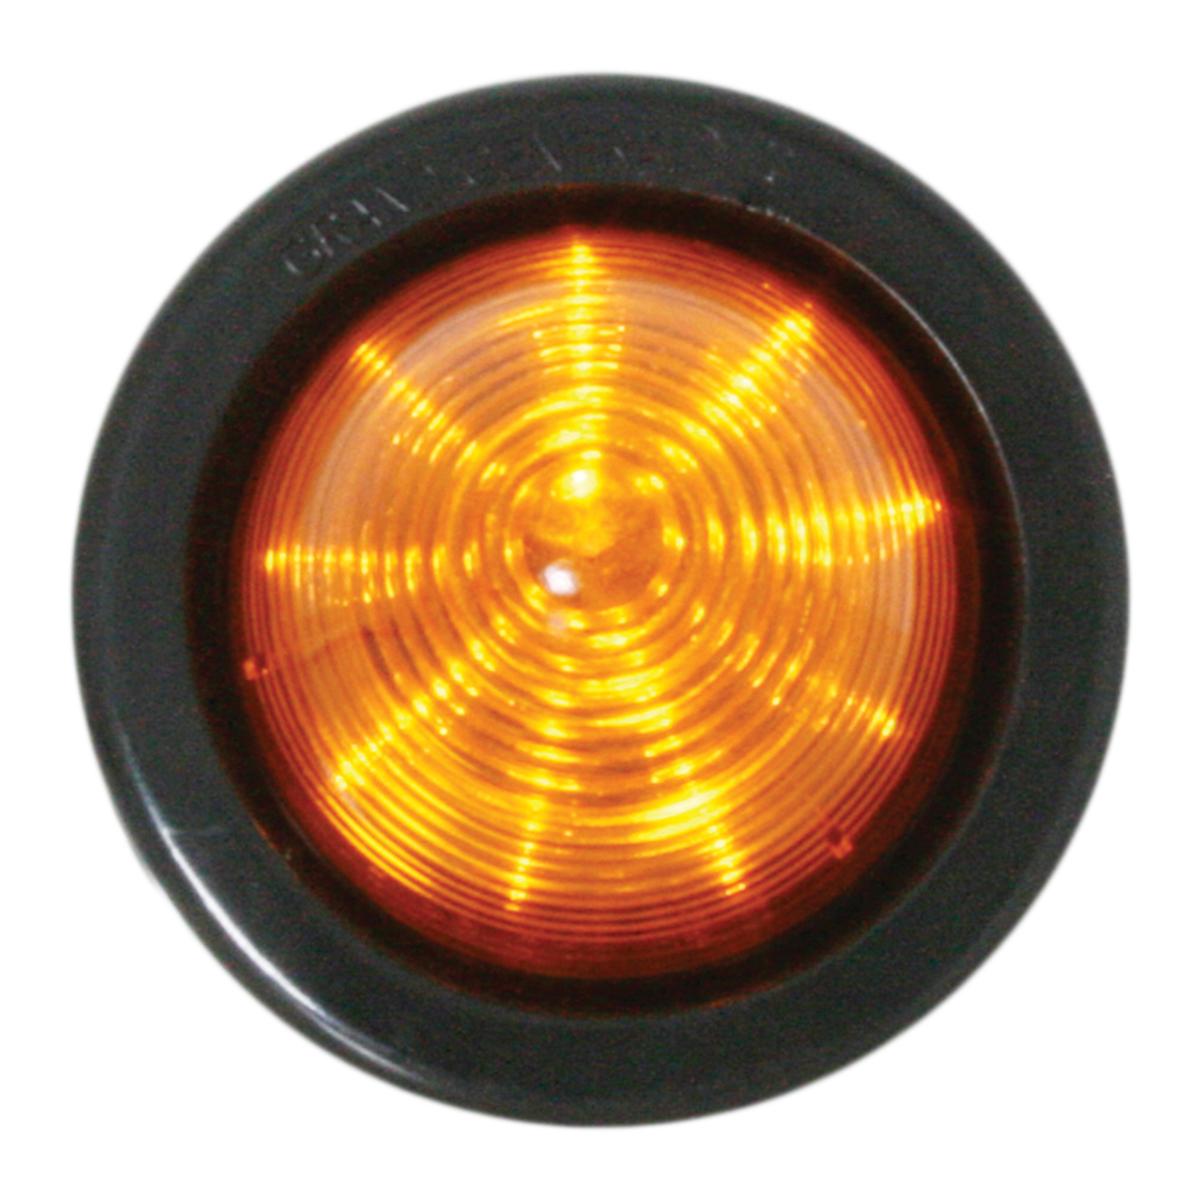 Beehive LED Marker Light with Black Rubber Grommet